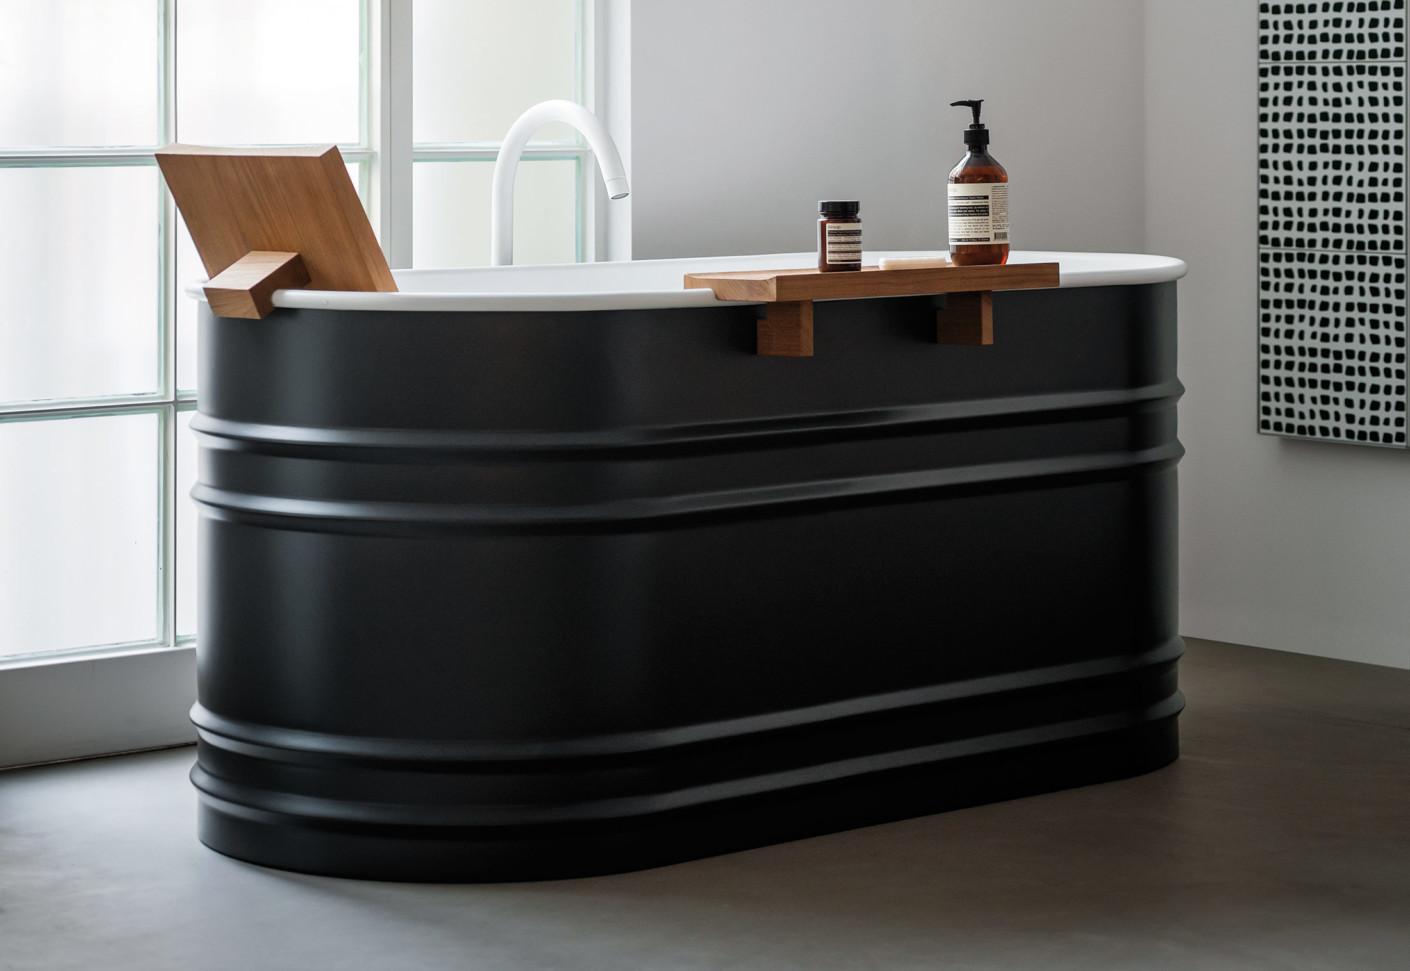 Vieques XS Bathtub By Agape STYLEPARK